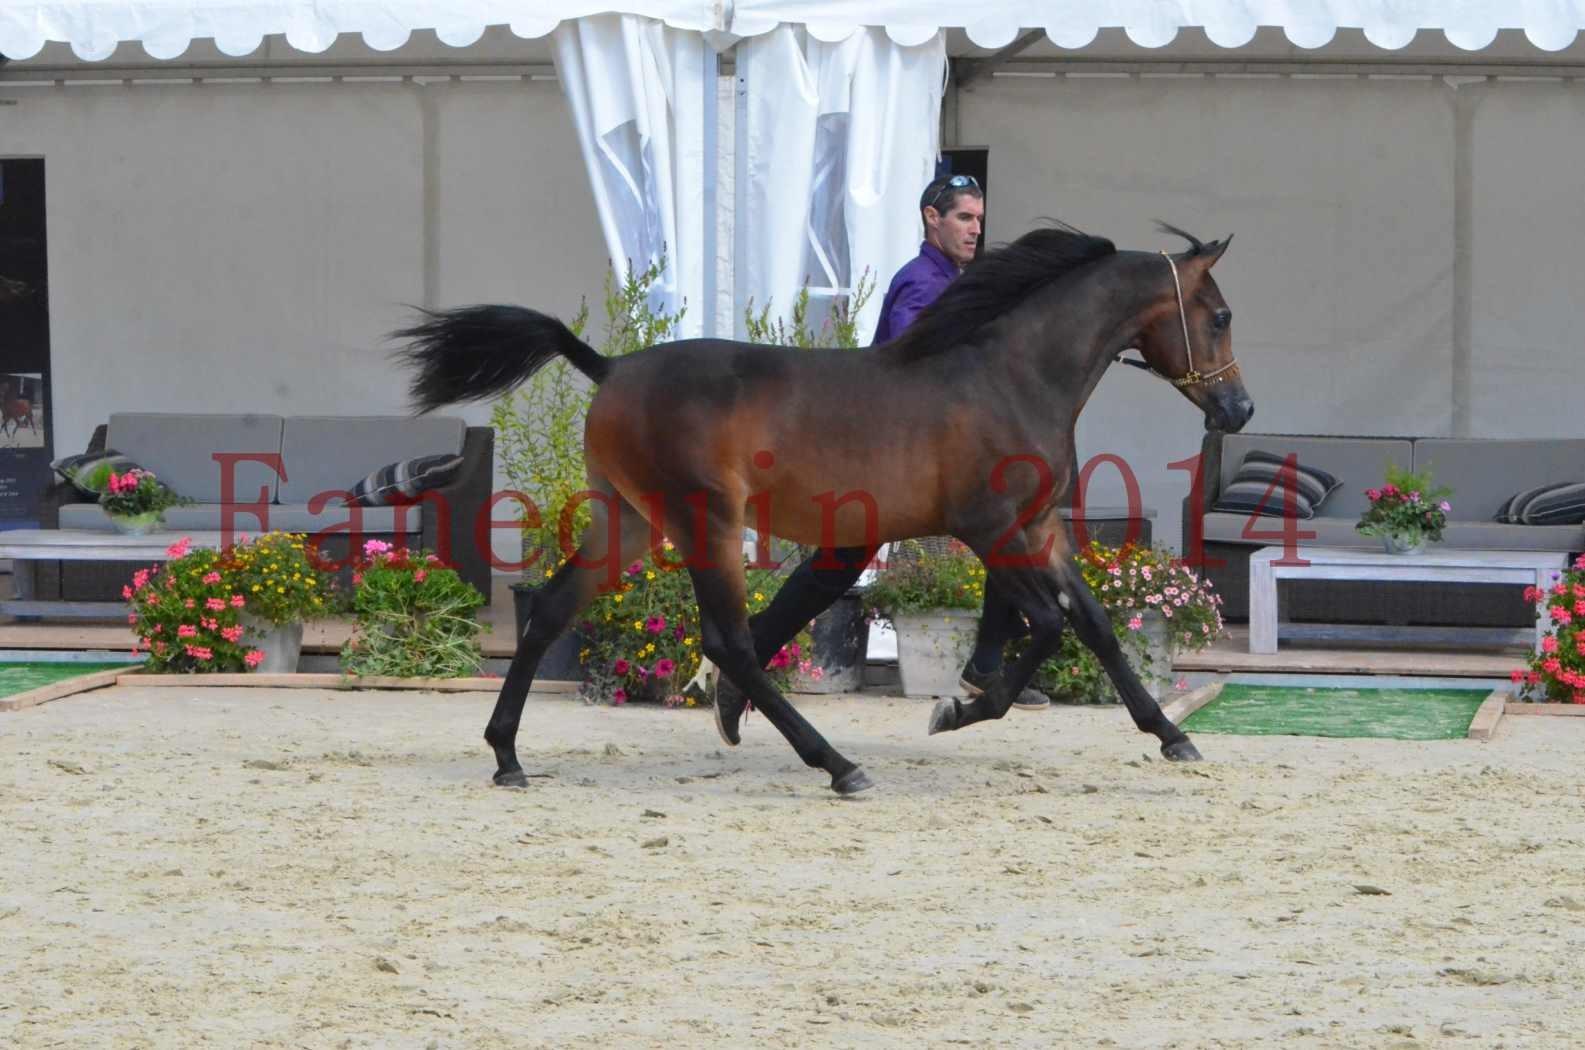 Championnat de FRANCE 2014 - Amateurs - SH FARAJAA - 28